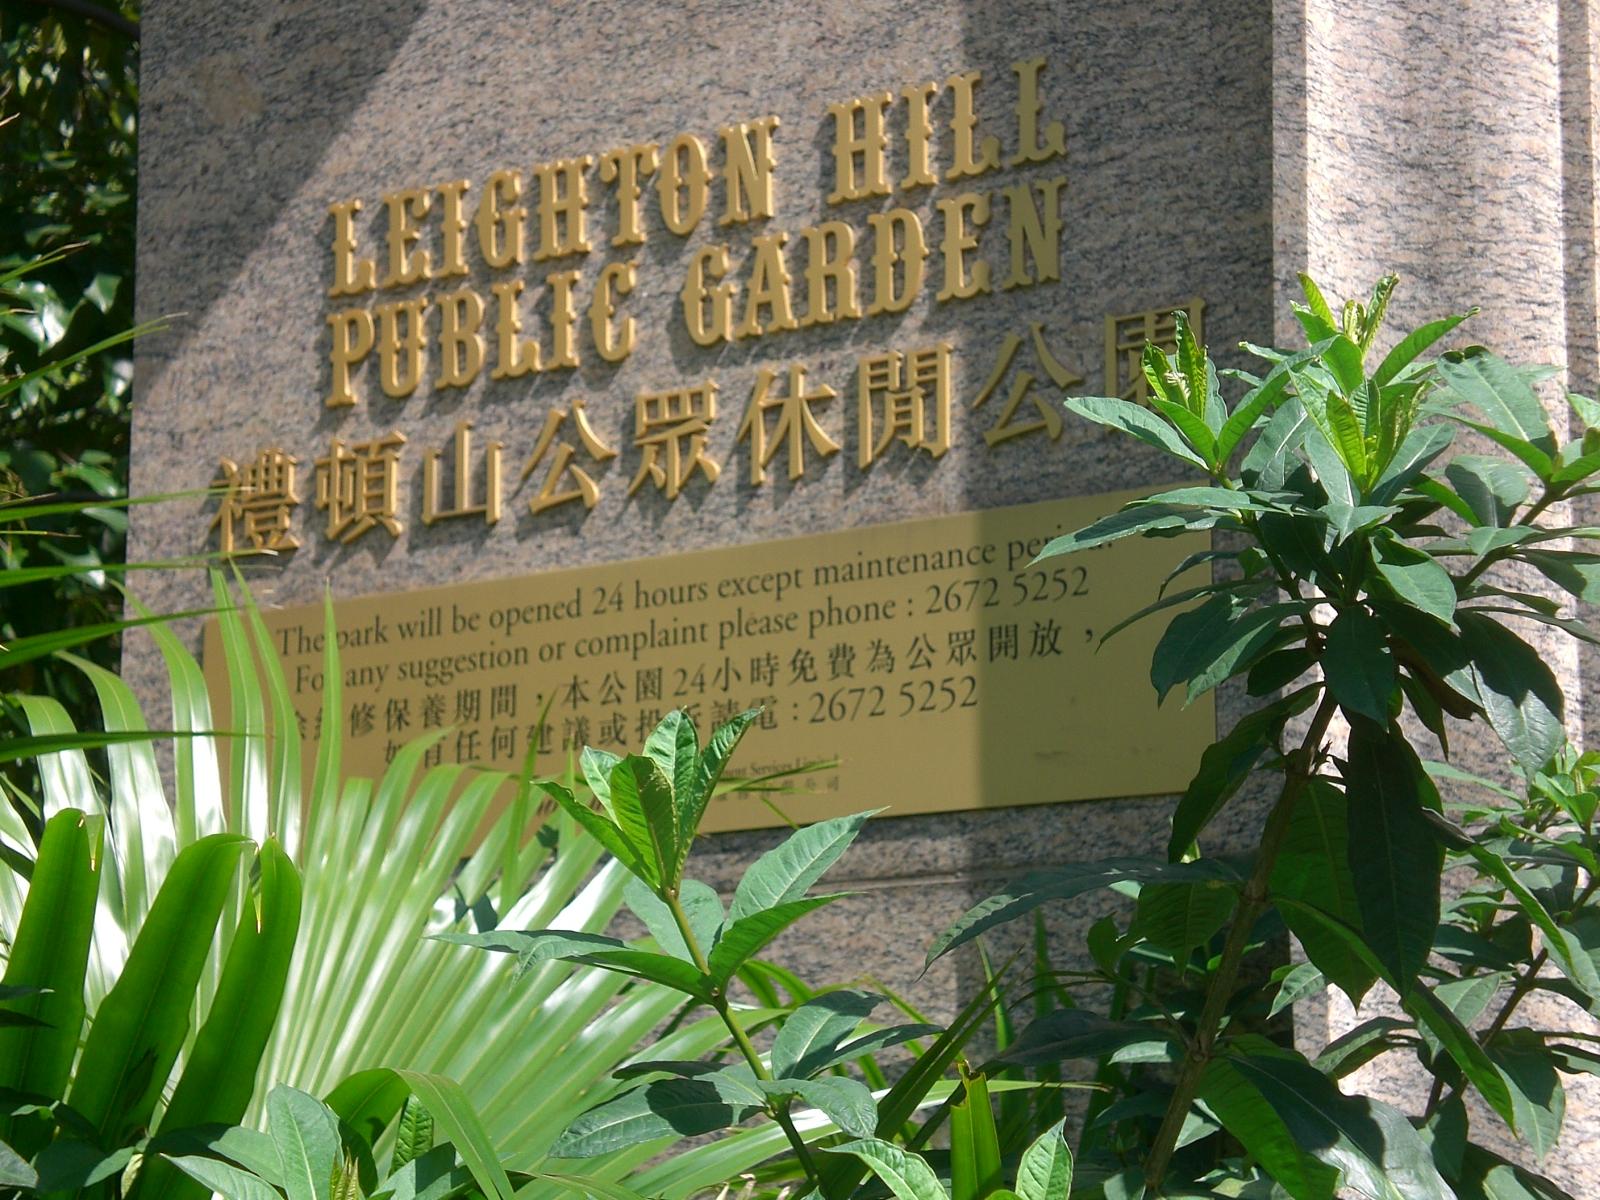 Fichier:HK CWB The Leighton Hill Public Garden 24 Hours Open